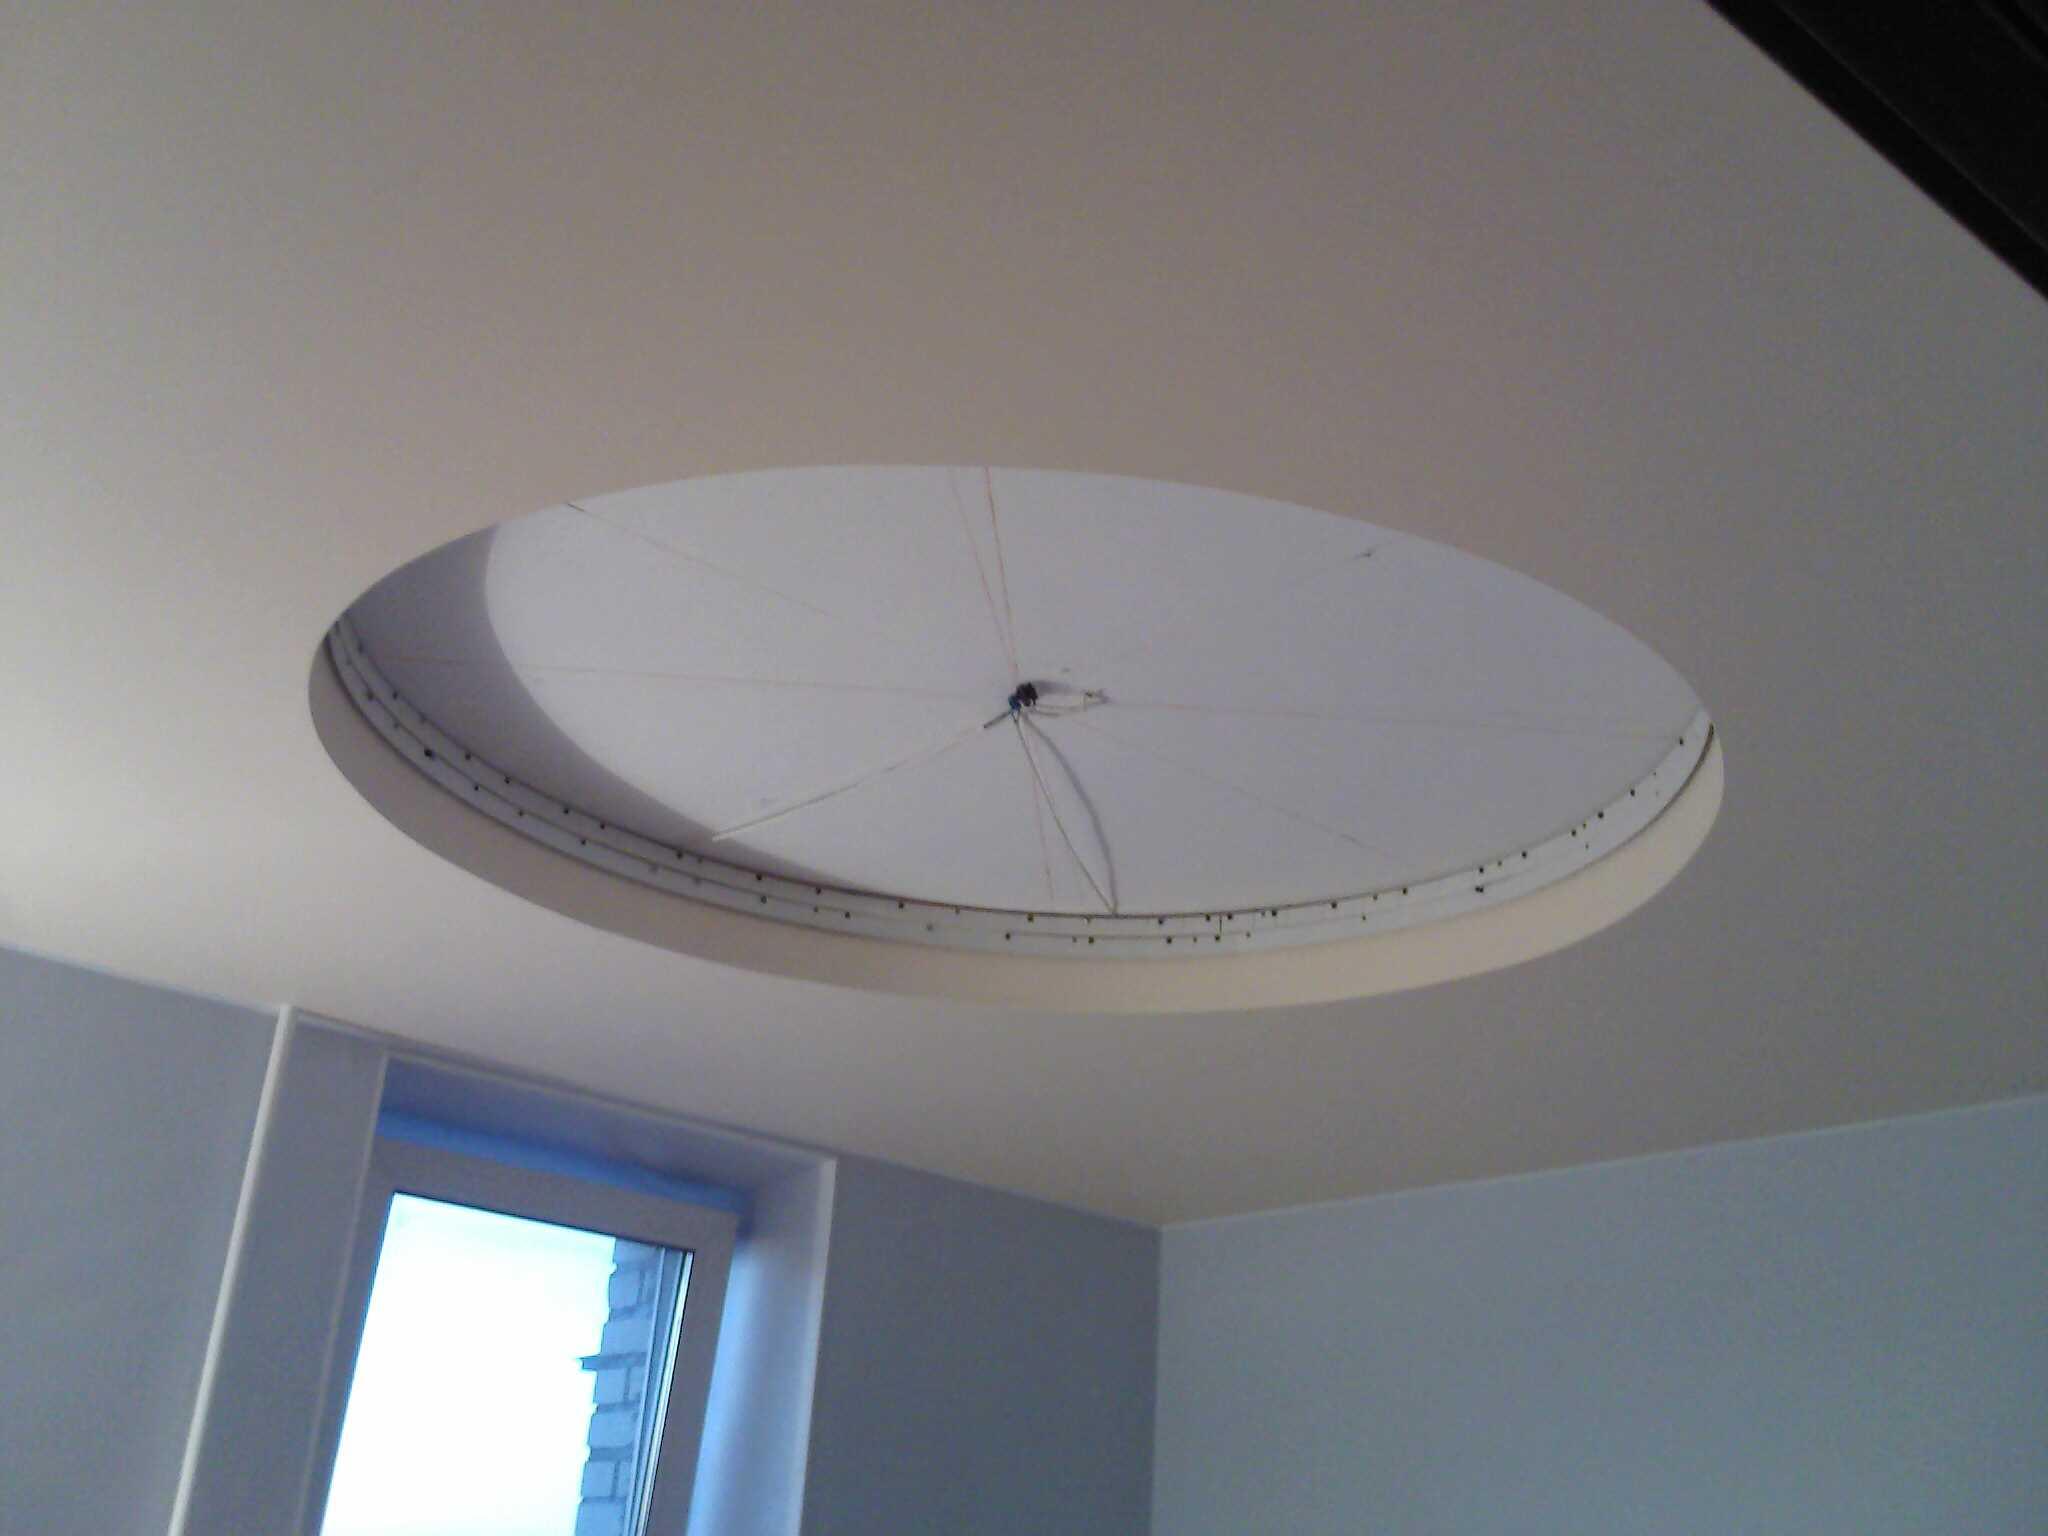 монтаж алюминиевого каркаса двухуровневого потолка в спальне